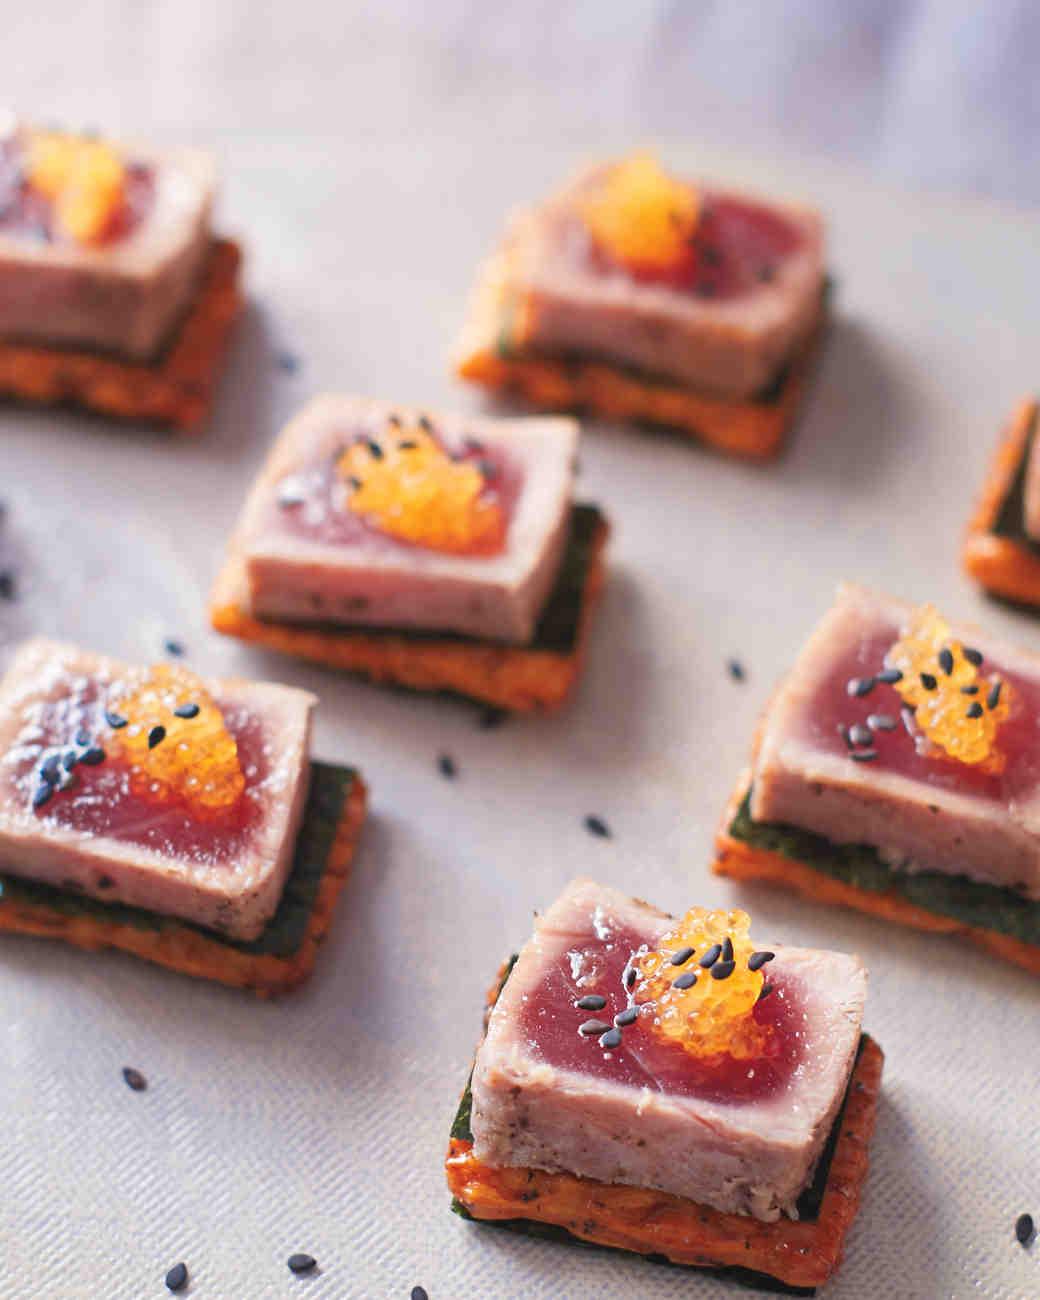 appetizer-tuna-seared-savory-bites-silos-308-mwd110998_vert.jpg